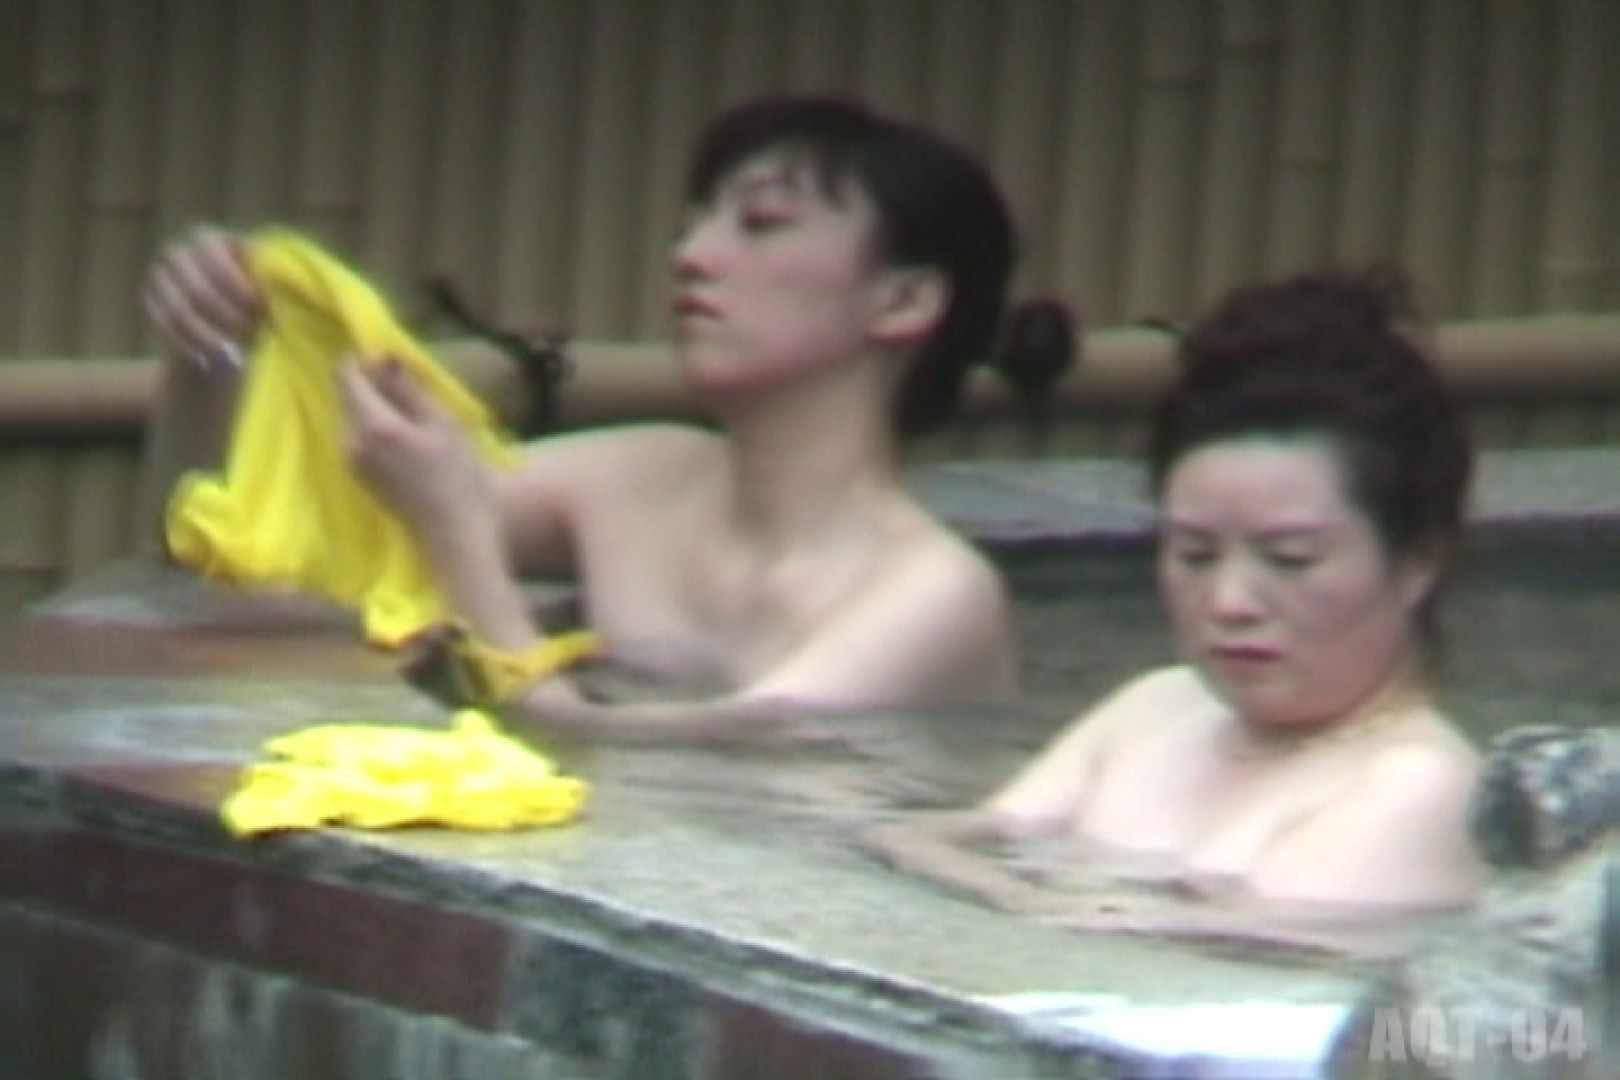 Aquaな露天風呂Vol.743 OLのプライベート ワレメ無修正動画無料 12pic 11